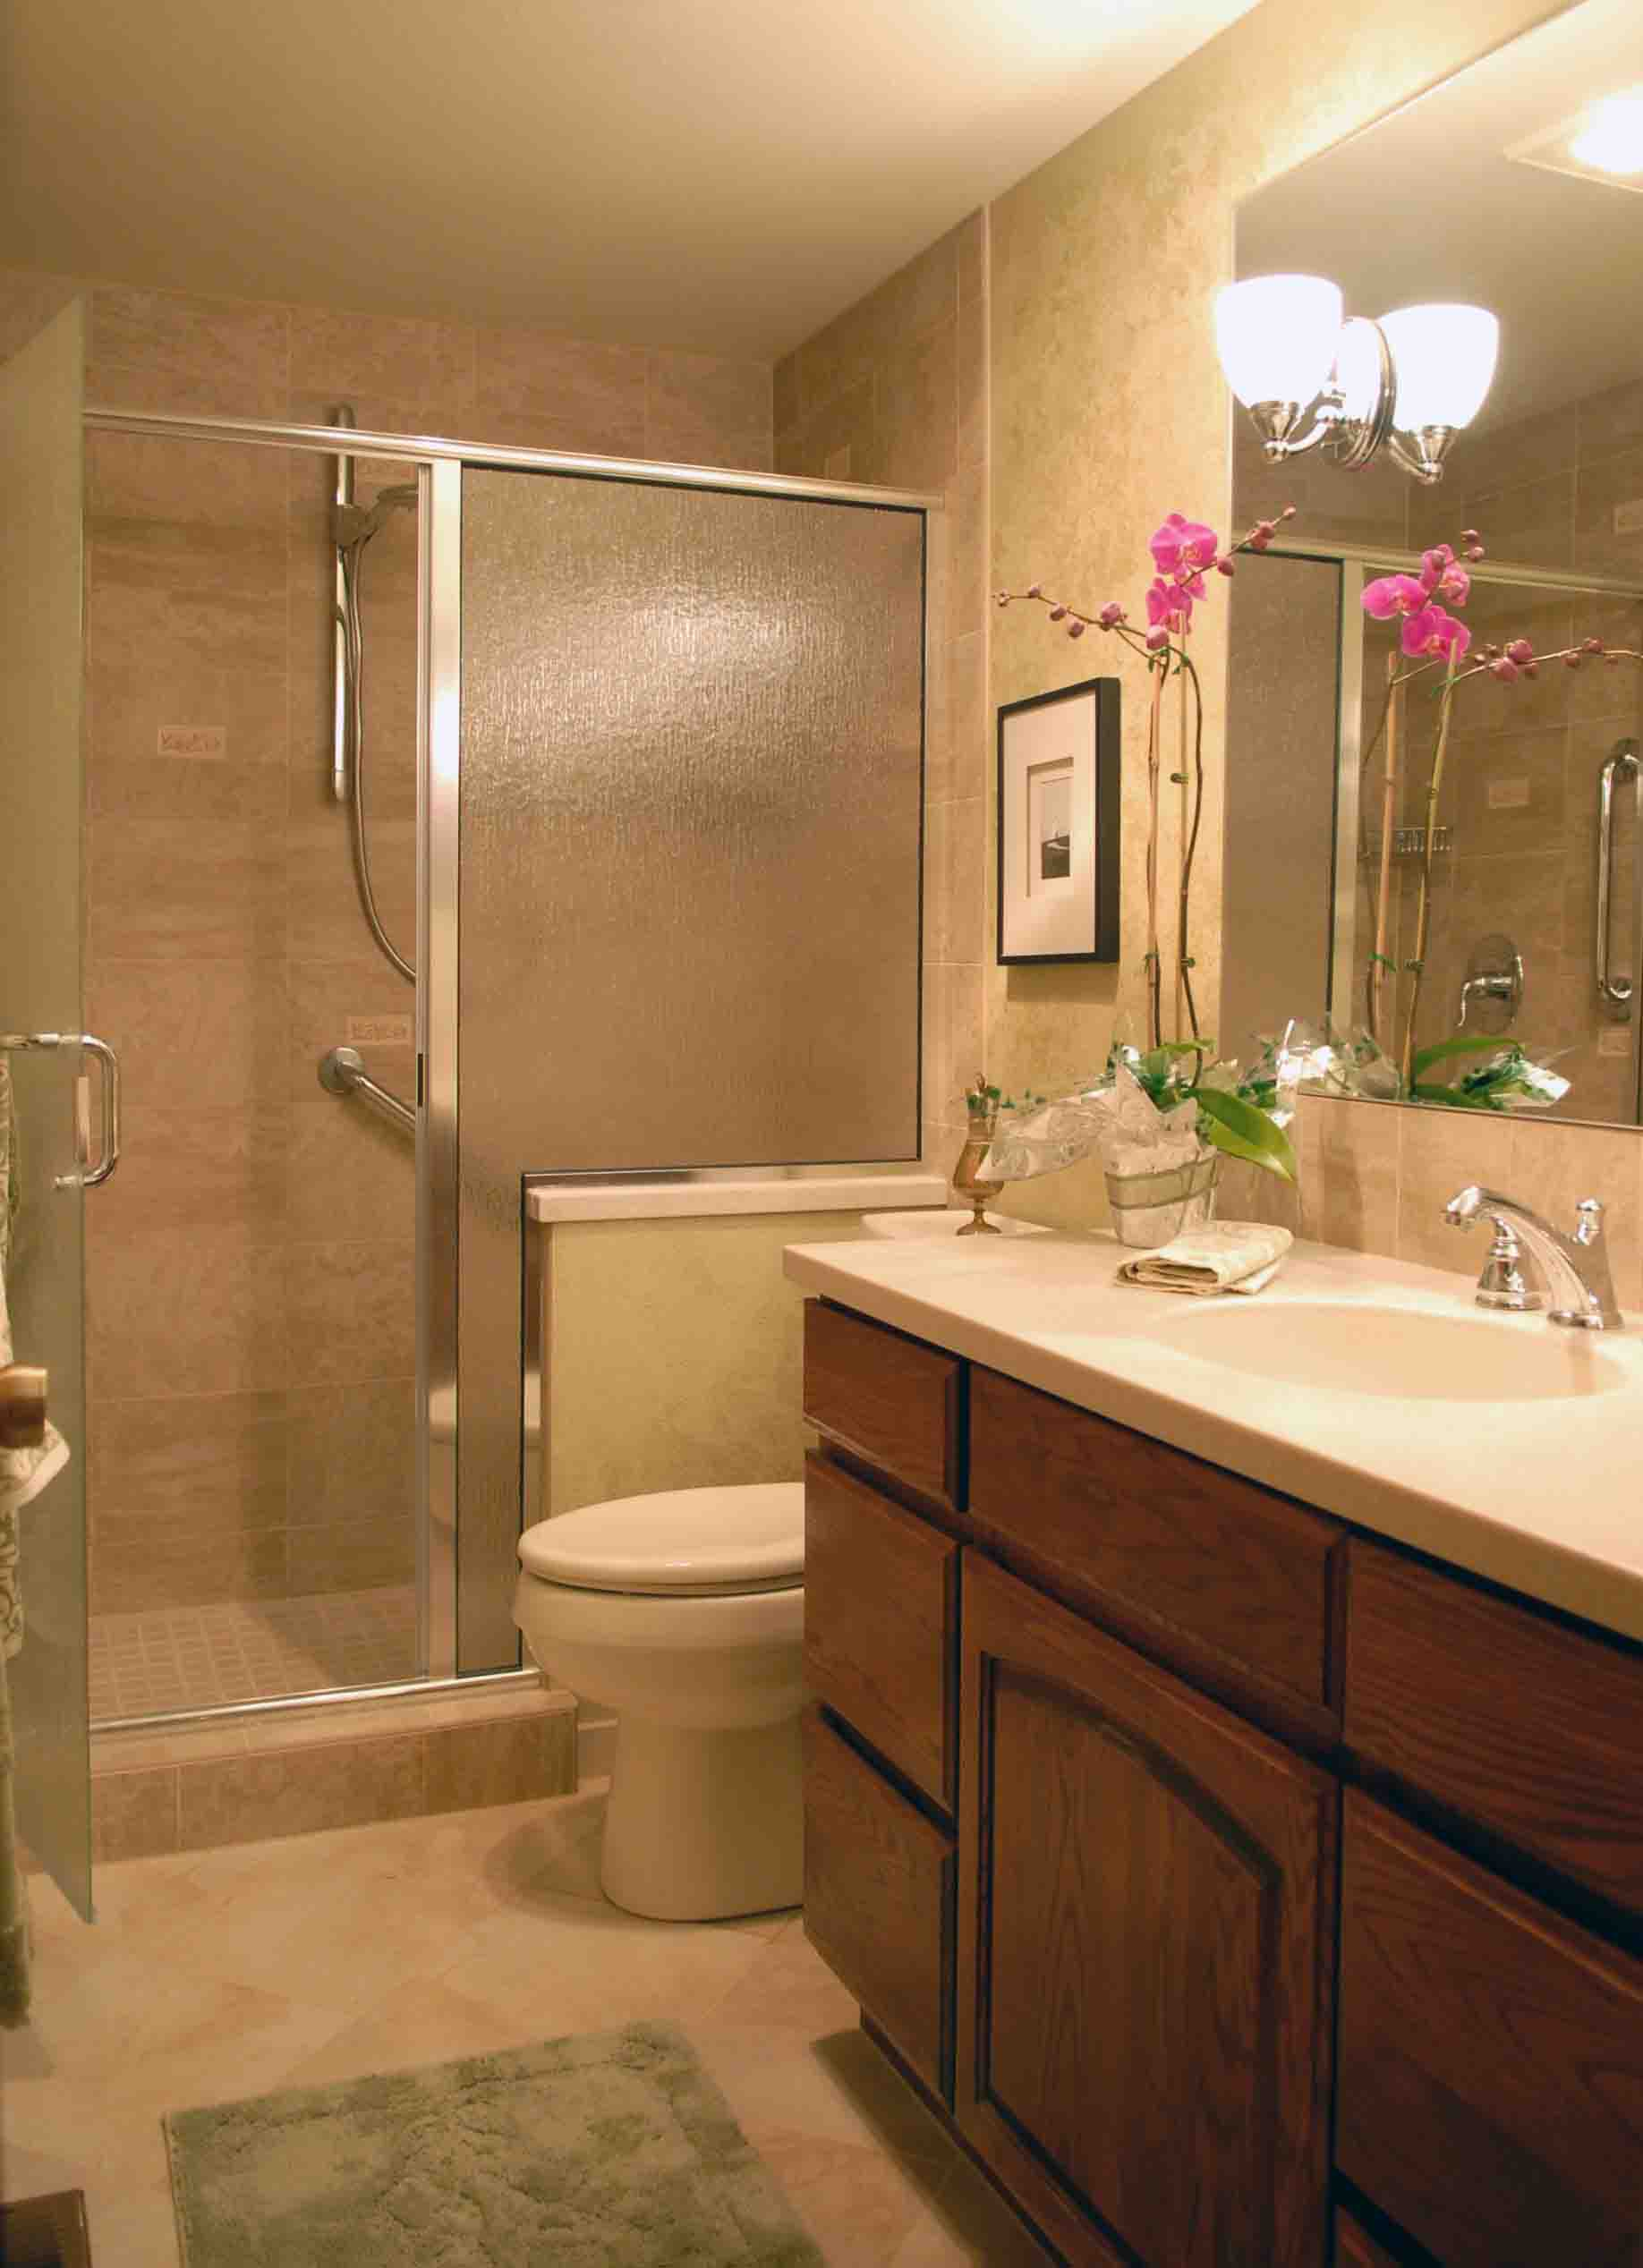 intercontinent Gorgeous Bathroom Decor to make your ... on Modern:5O8Dgixth9O= Small Bathroom Design  id=69085